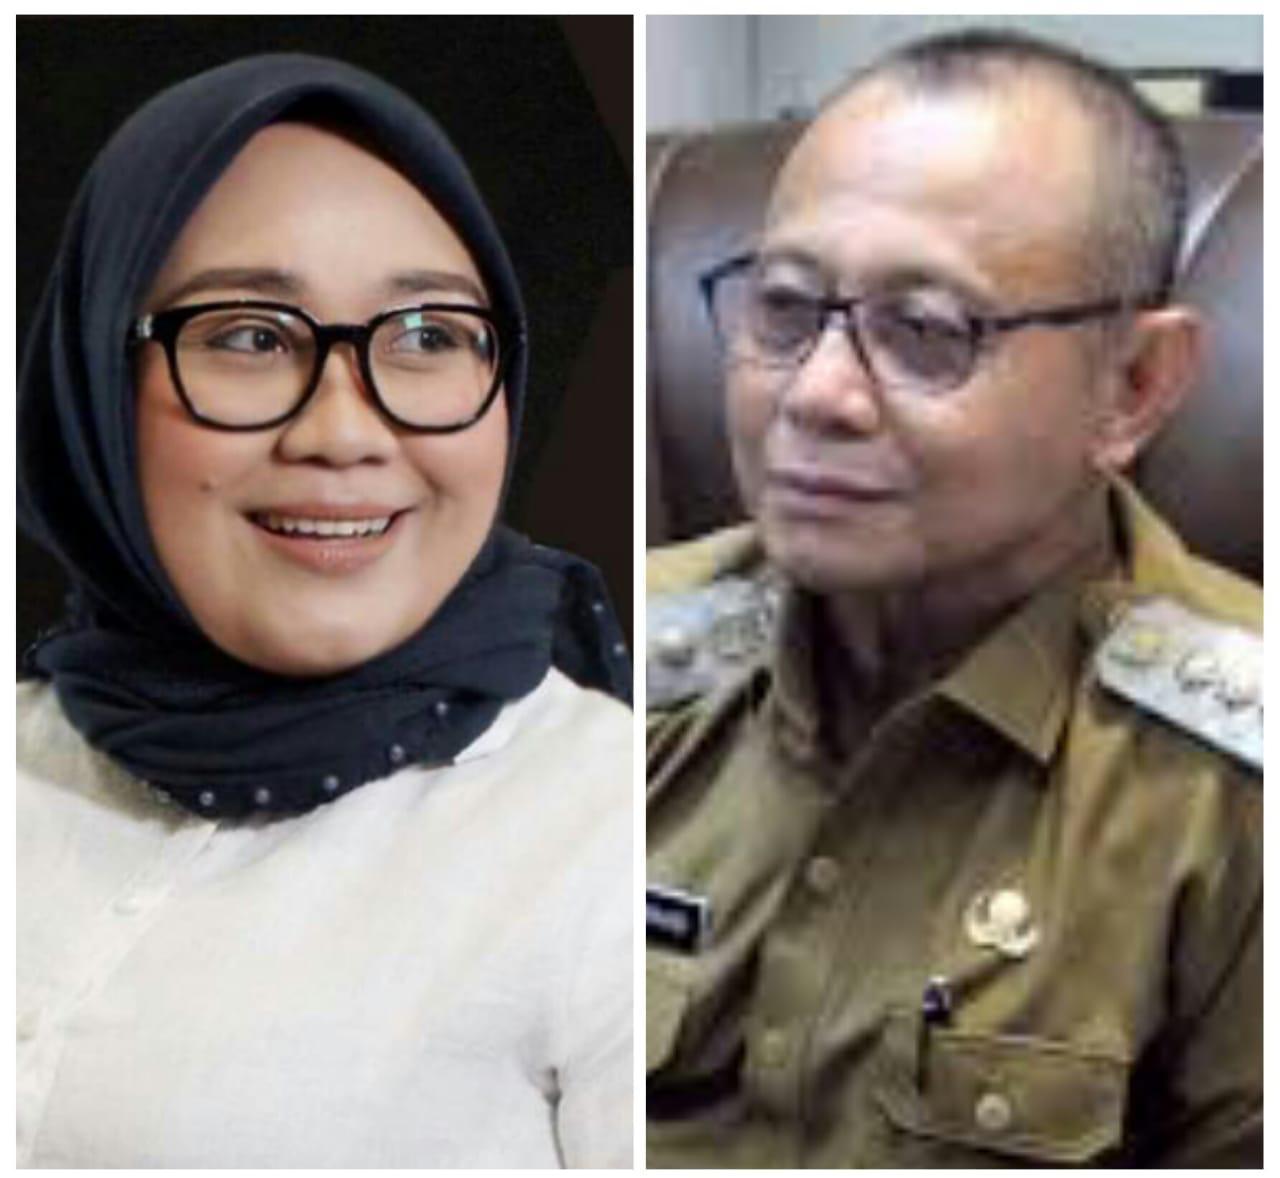 Gambar Tina Selangkah di Depan, Incumbent Gagal Pinang PAN